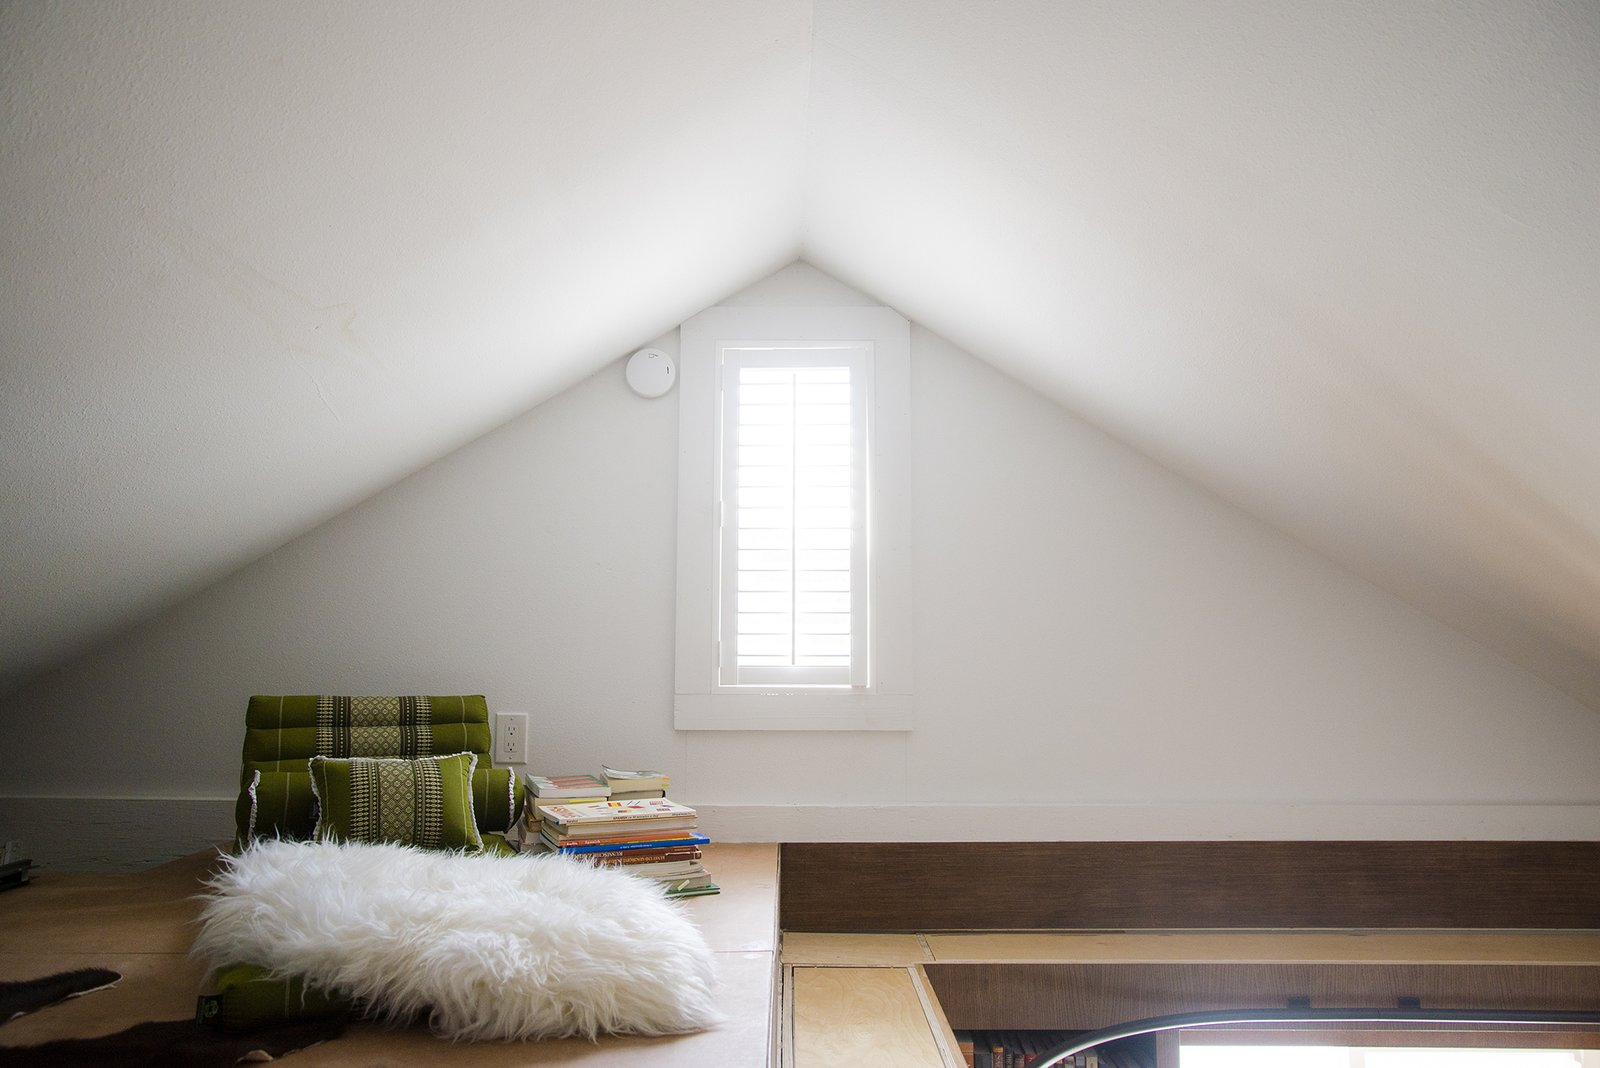 Everald Colas Storyn Studio for Architecture garage renovation